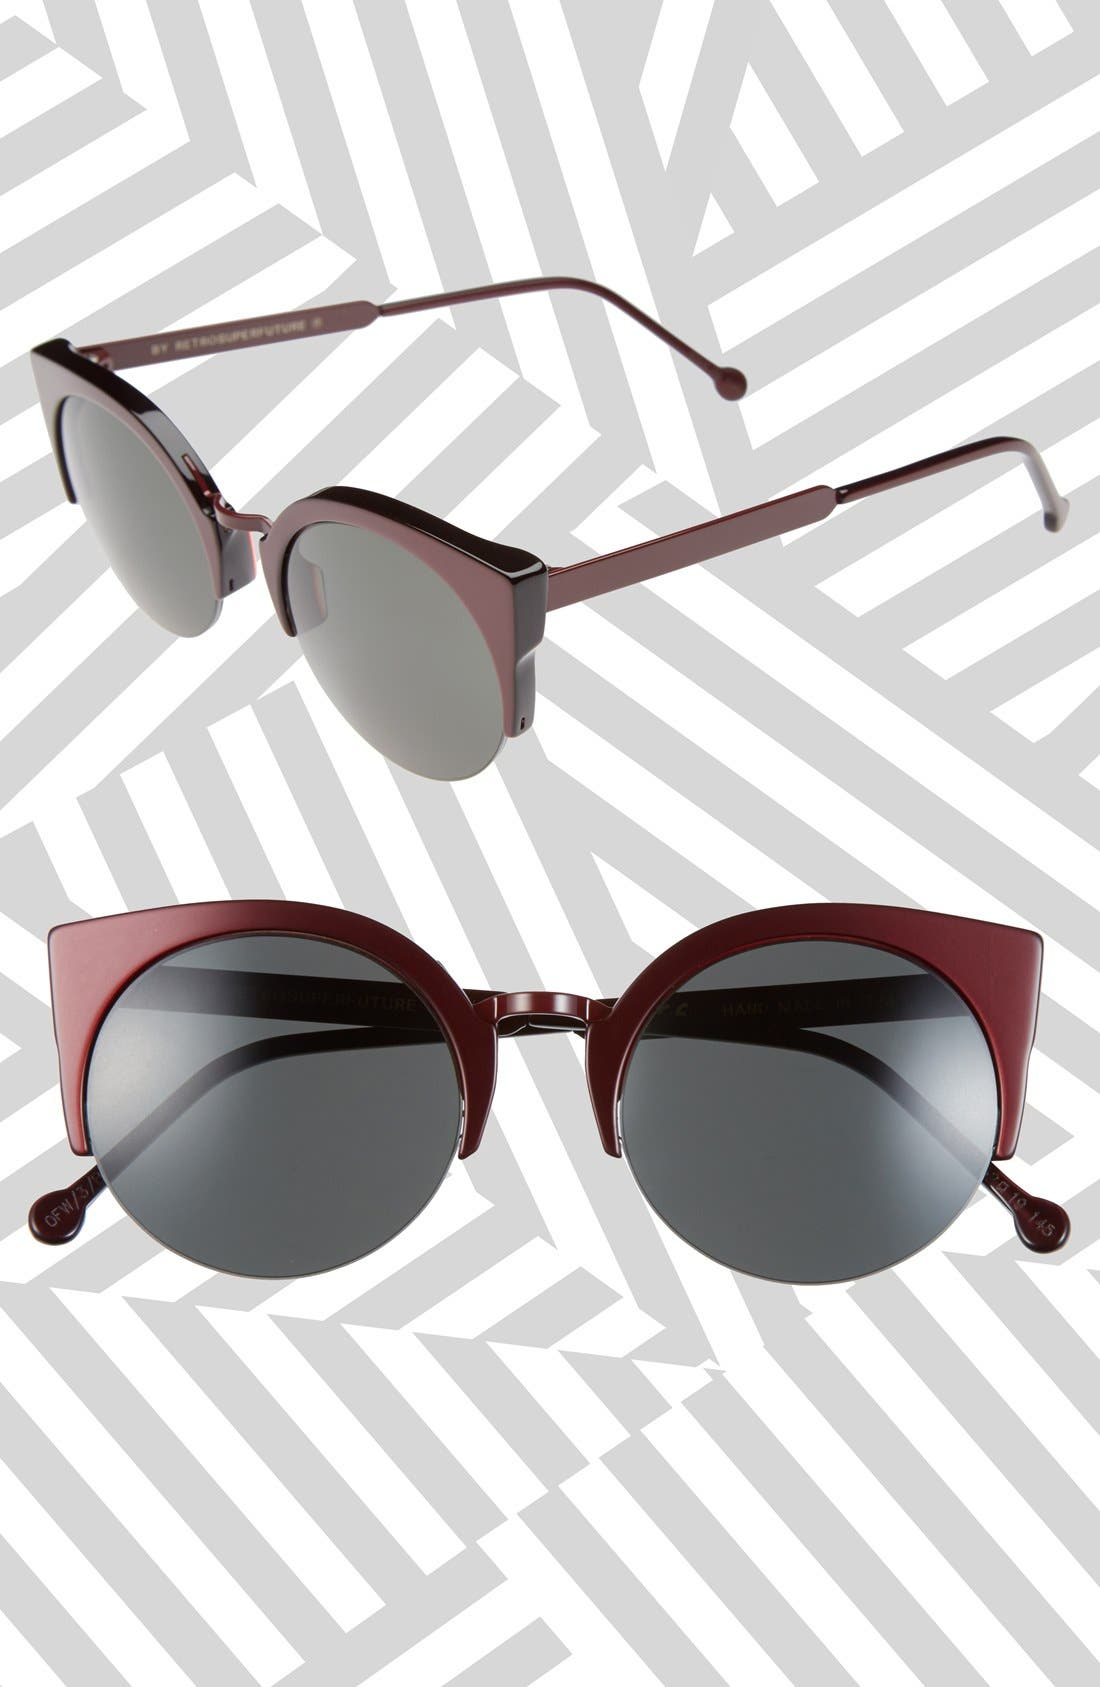 Alternate Image 1 Selected - SUPER by RETROSUPERFUTURE® 'Lucia Francis Femmena' 52mm Sunglasses